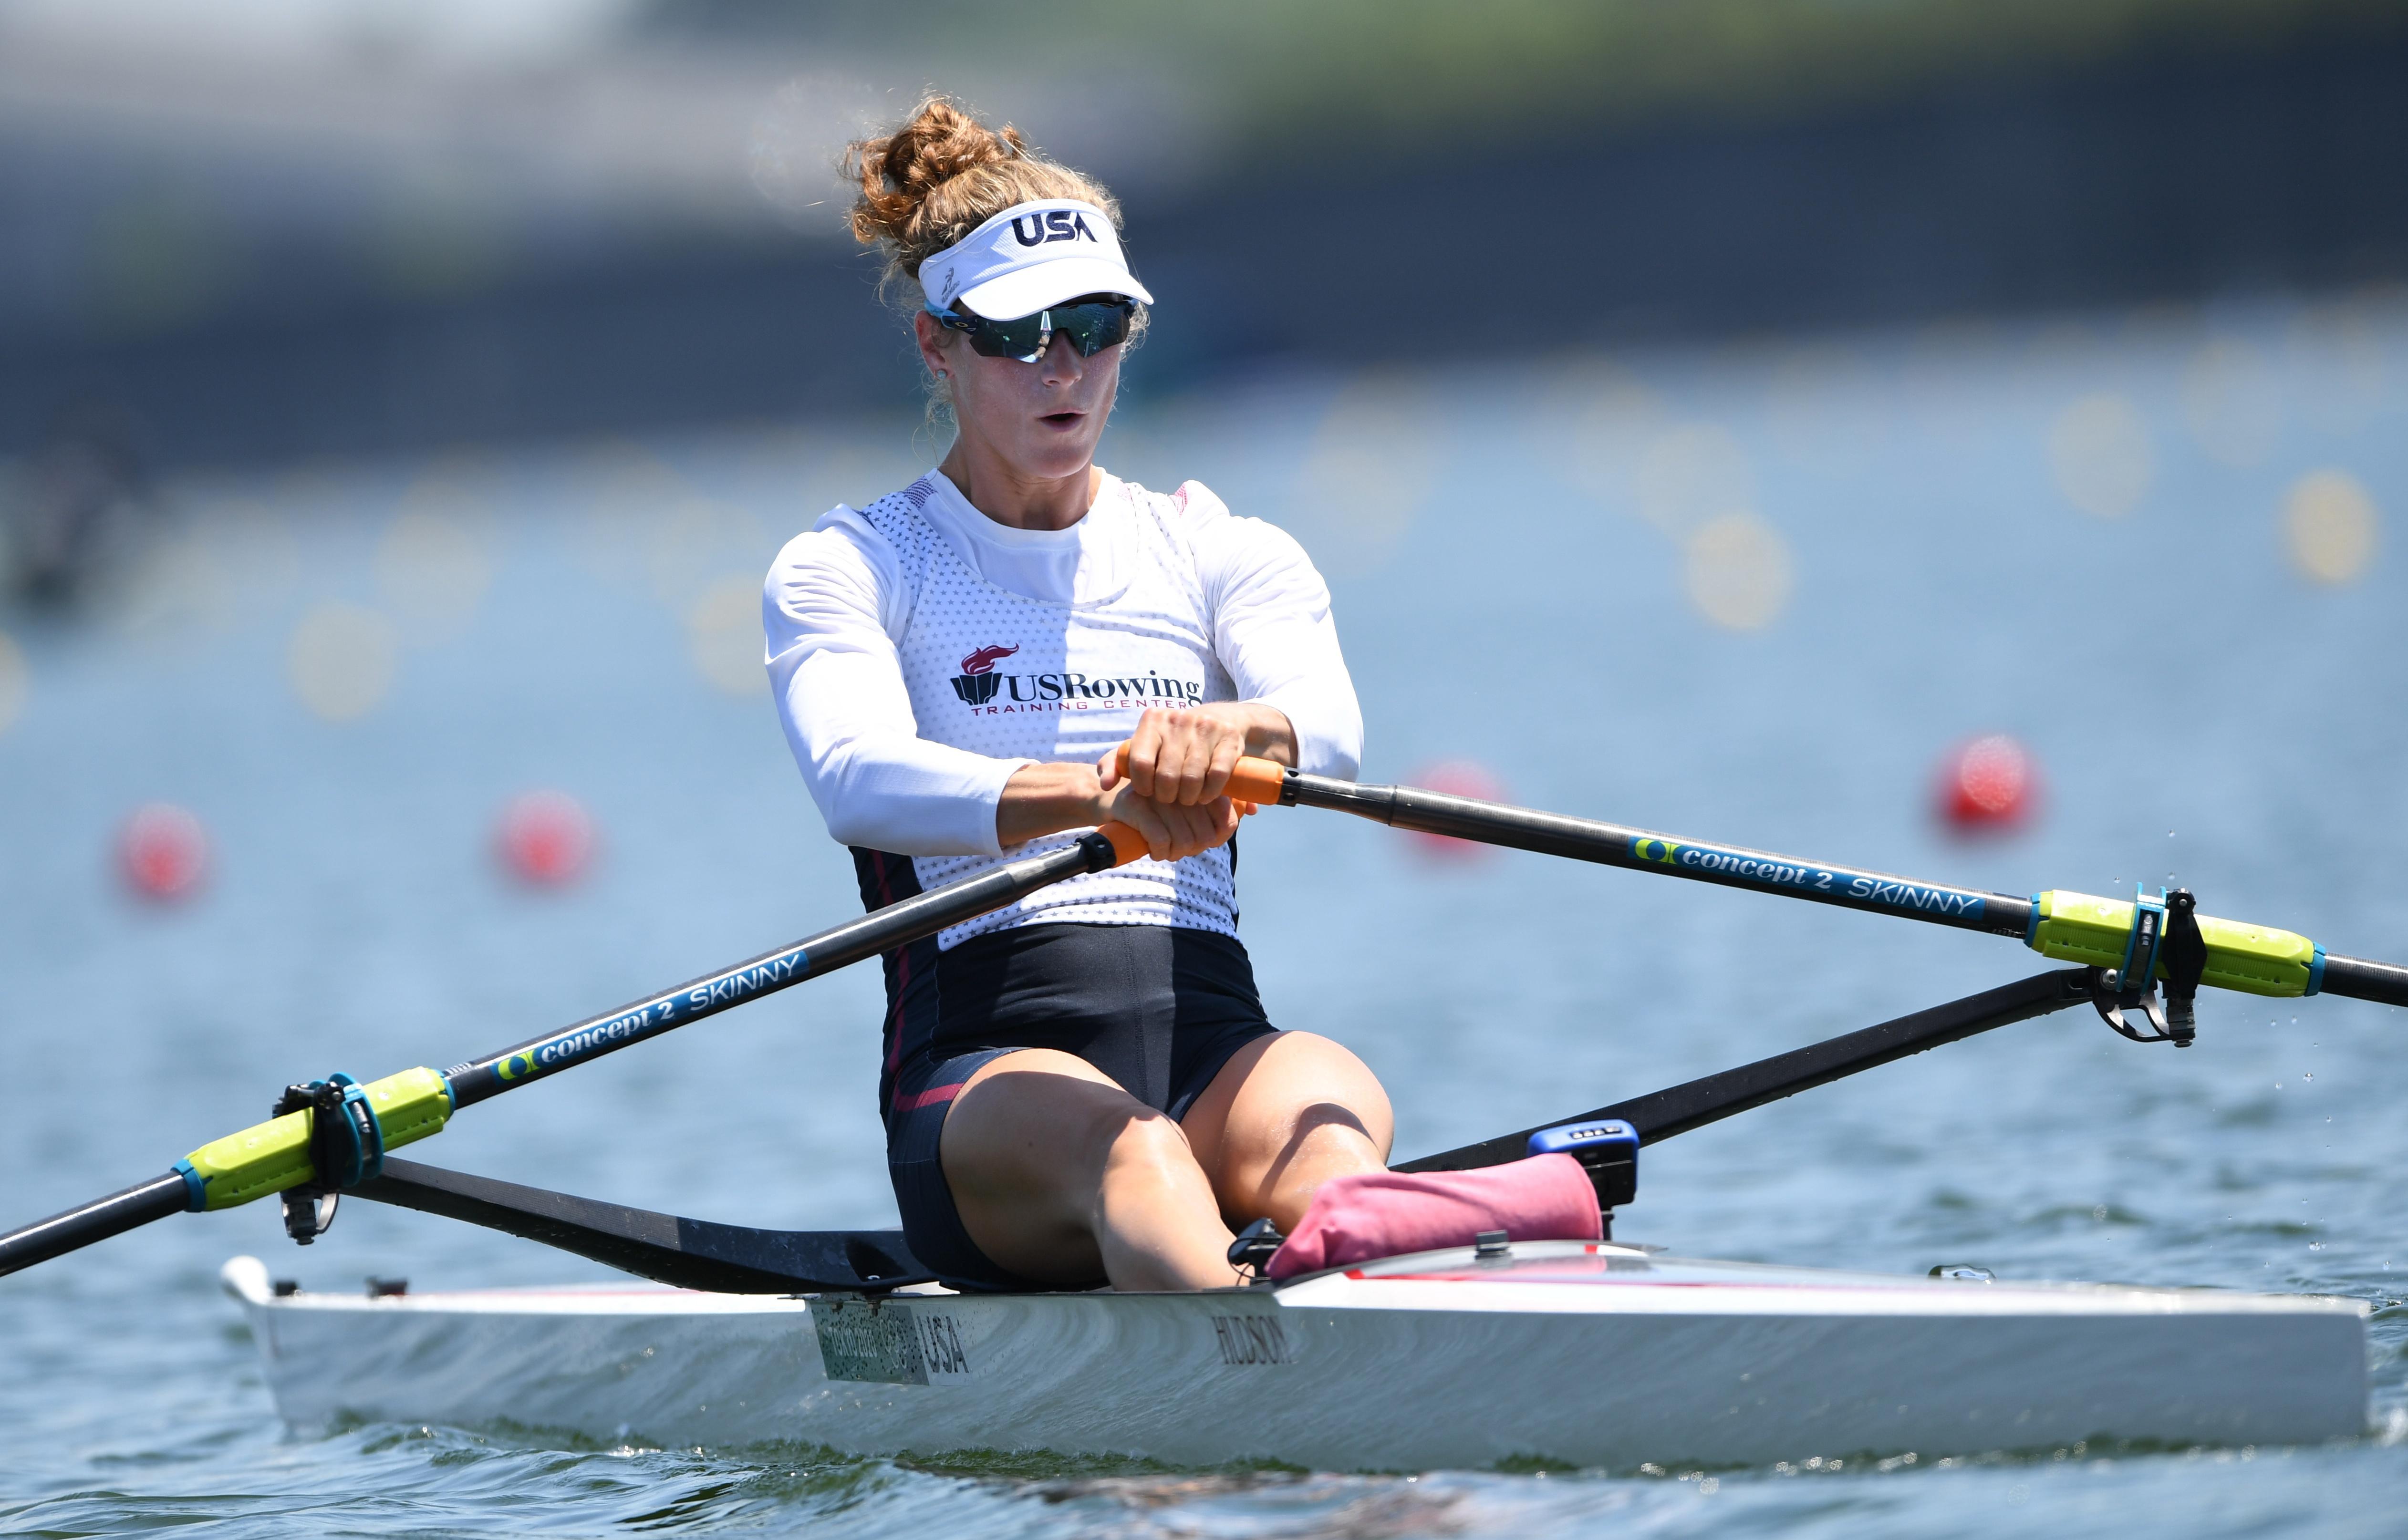 Tokyo 2020 Olympics - Rowing Training - Sea Forest Waterway, Tokyo, Japan - July 22, 2021 Kara Kohler of the United States during training REUTERS/Piroschka Van De Wouw